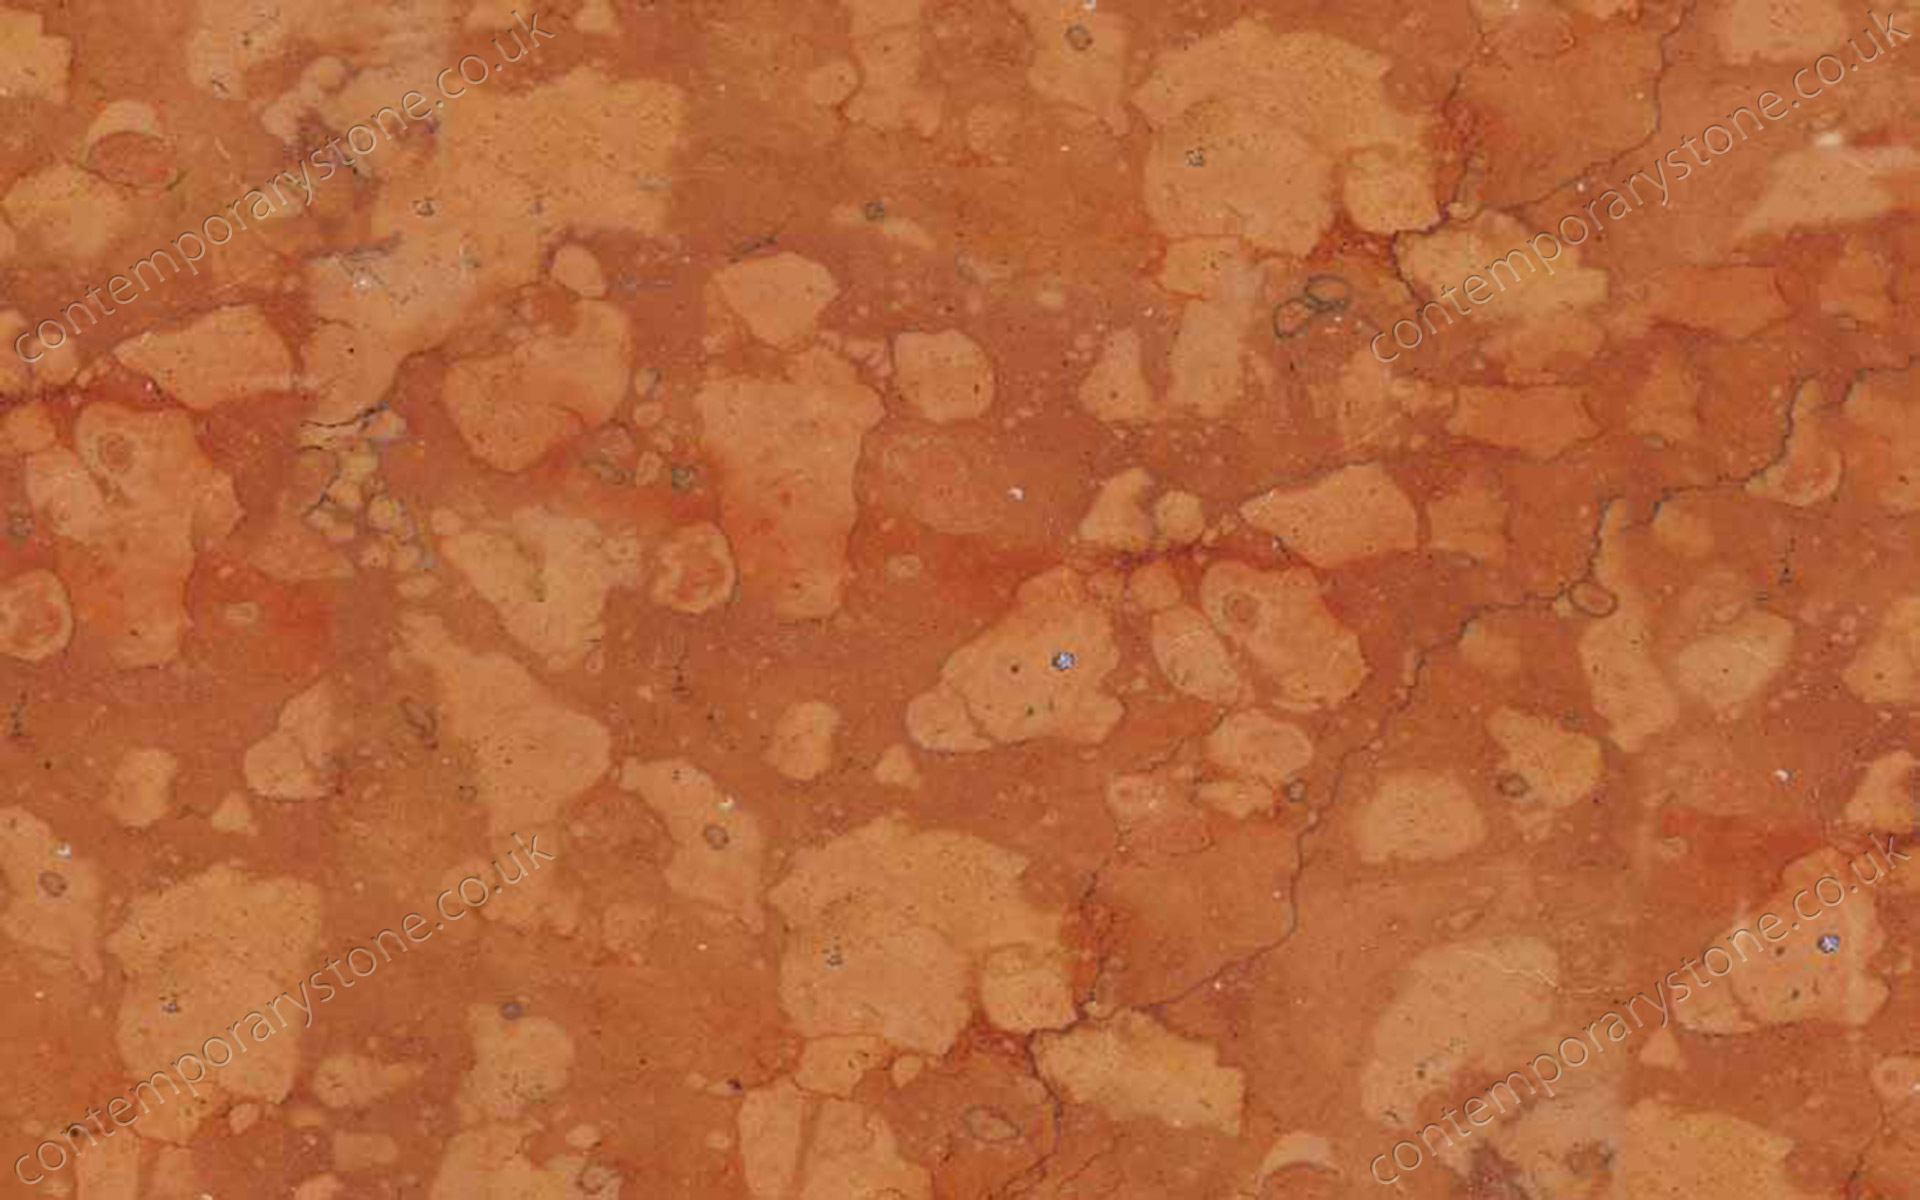 Rosso Verona marble close-up